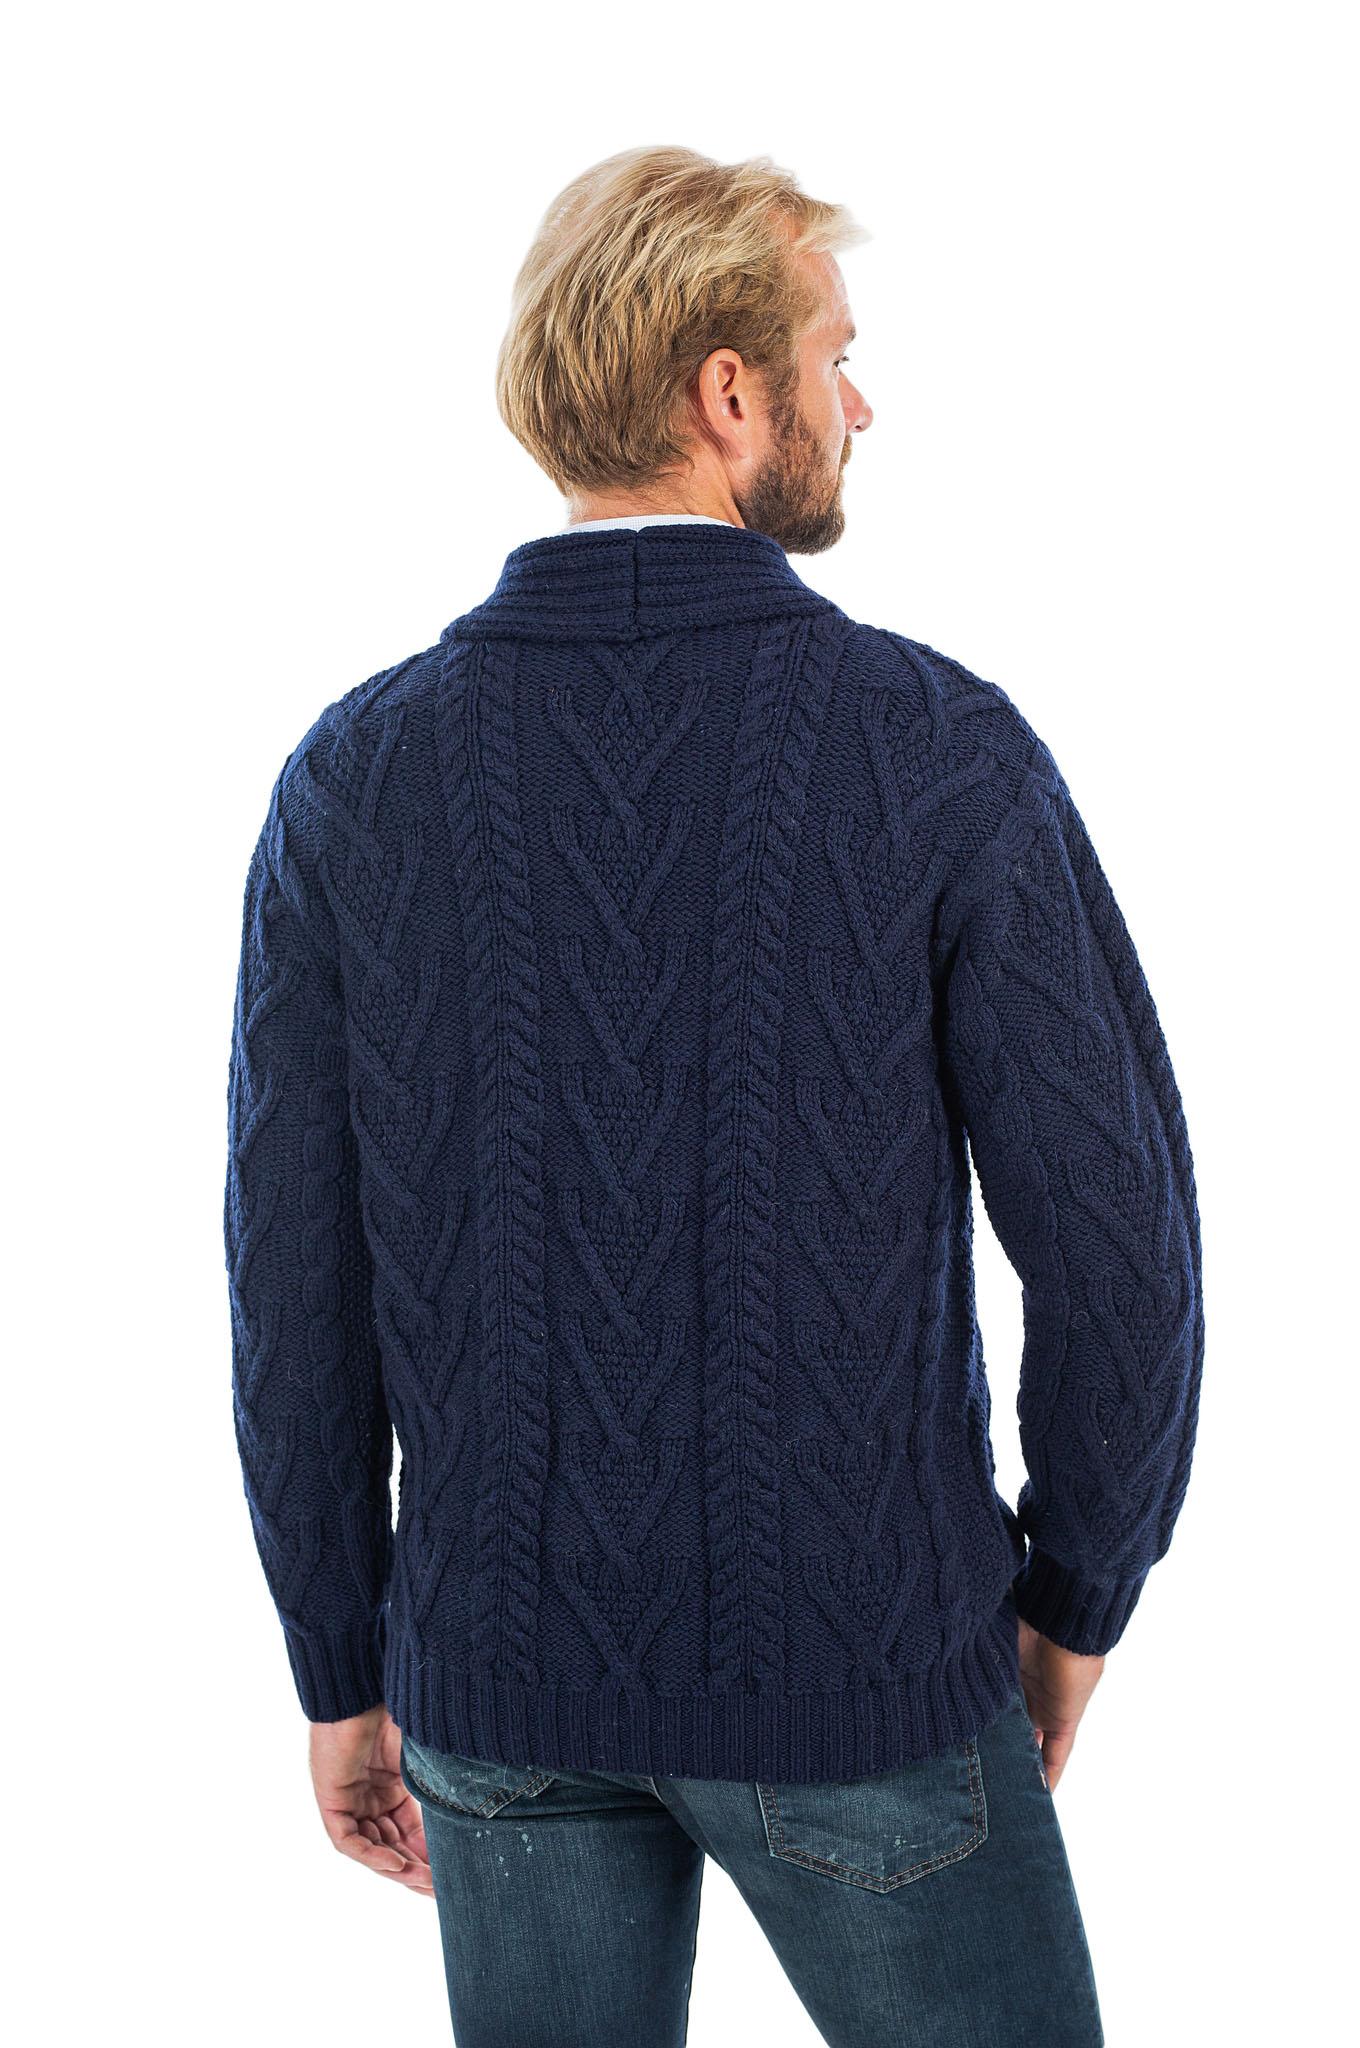 SAOL-Mens-Irish-Merino-Wool-Cardigan-Shawl-Collar-Front-Pockets-Aran-Cable-Knit thumbnail 17